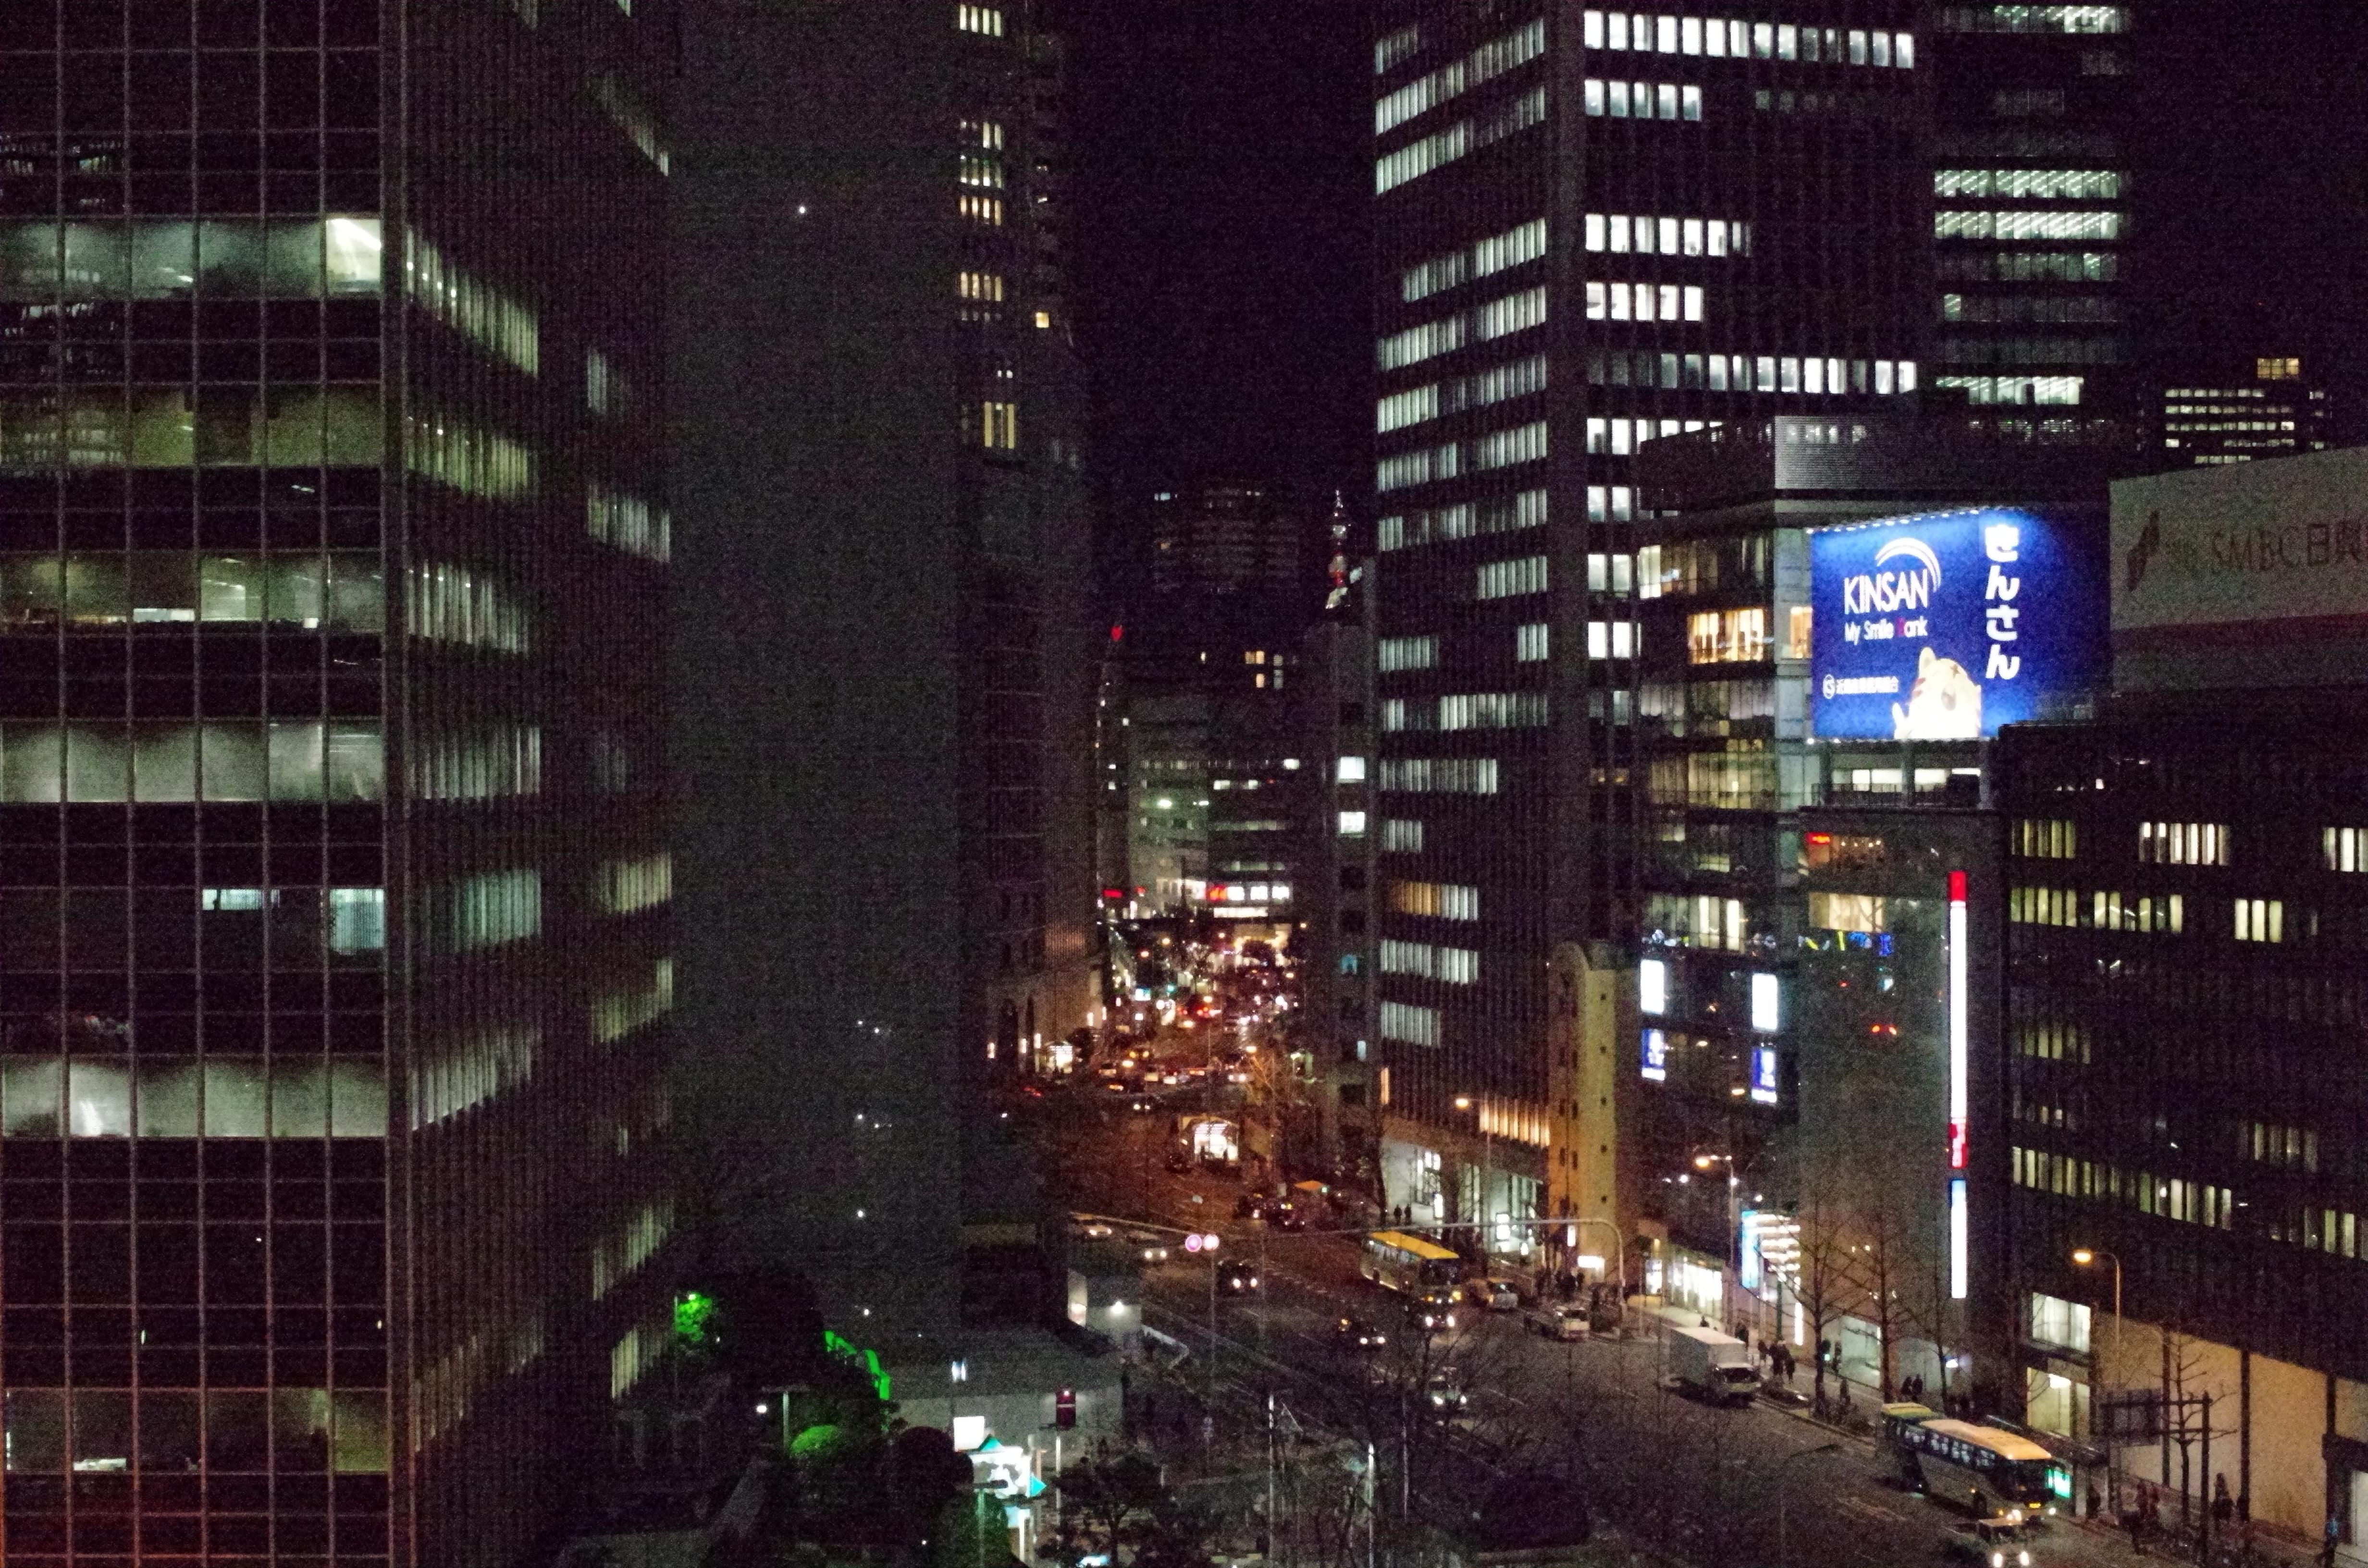 http://www.yaotomi.co.jp/blog/used/night-k5iis-51200.JPG